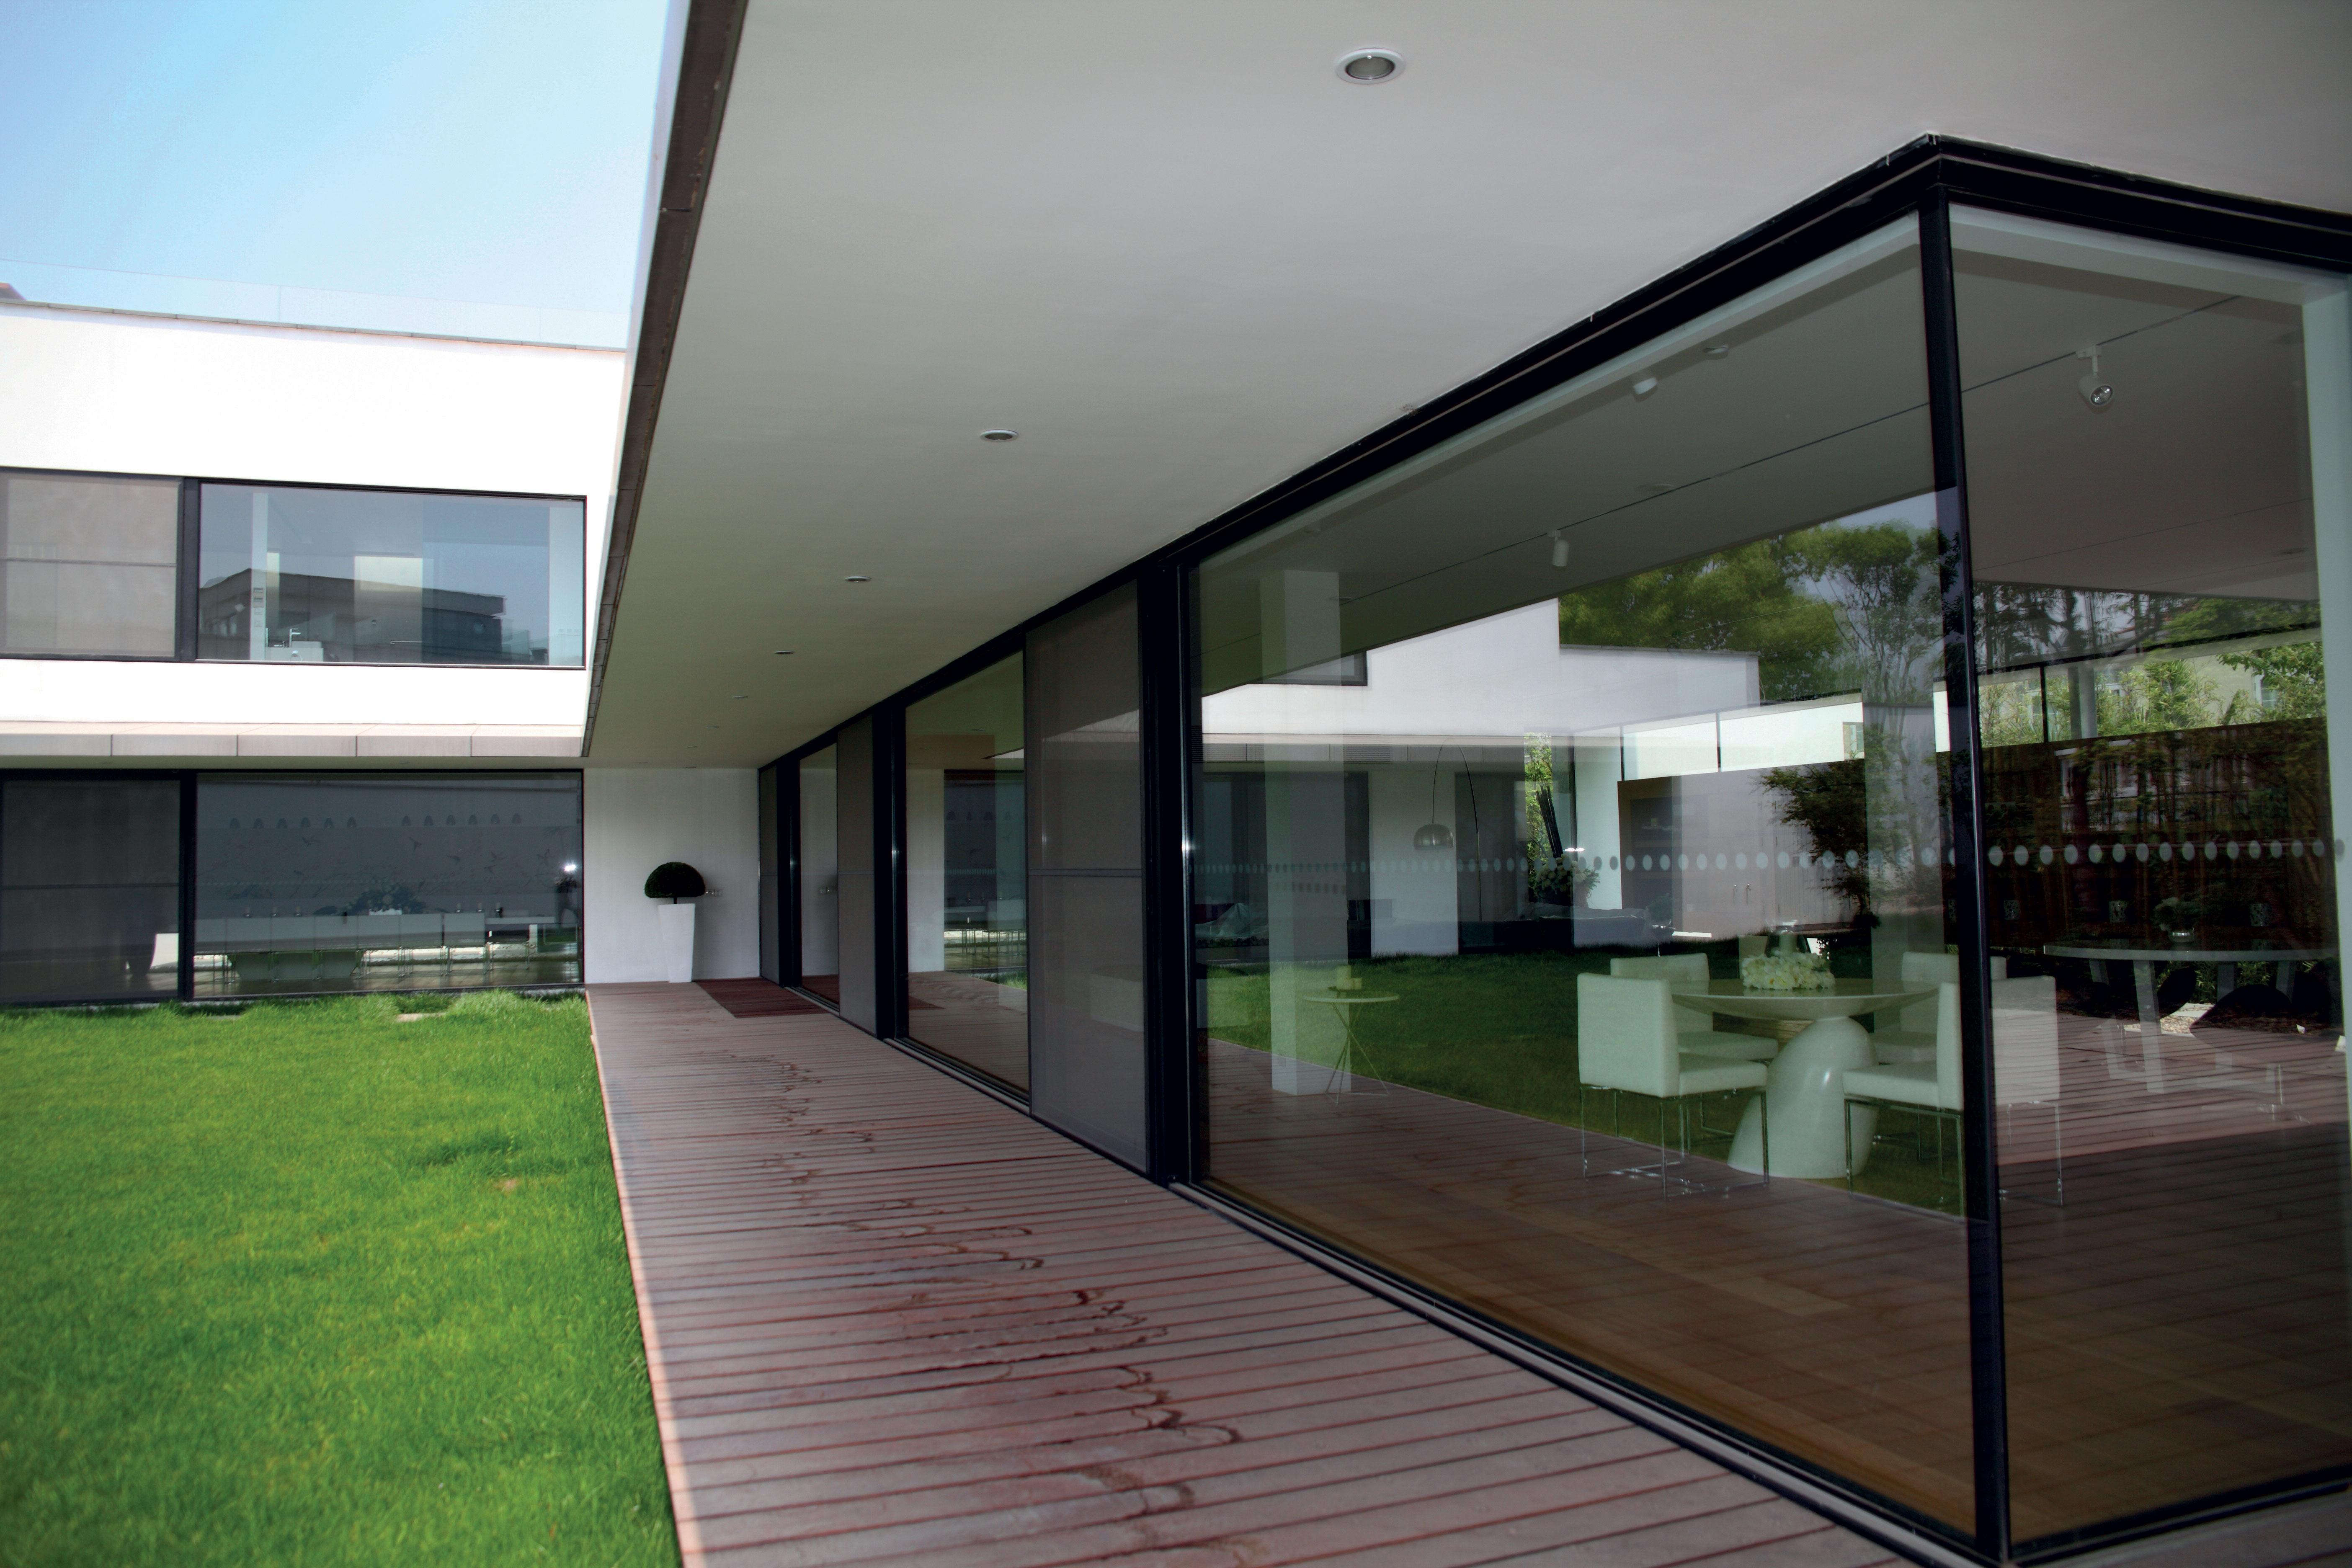 Large-aluminium-windows-bring-tranquil-garden-views-into-this-Shanghai-villa